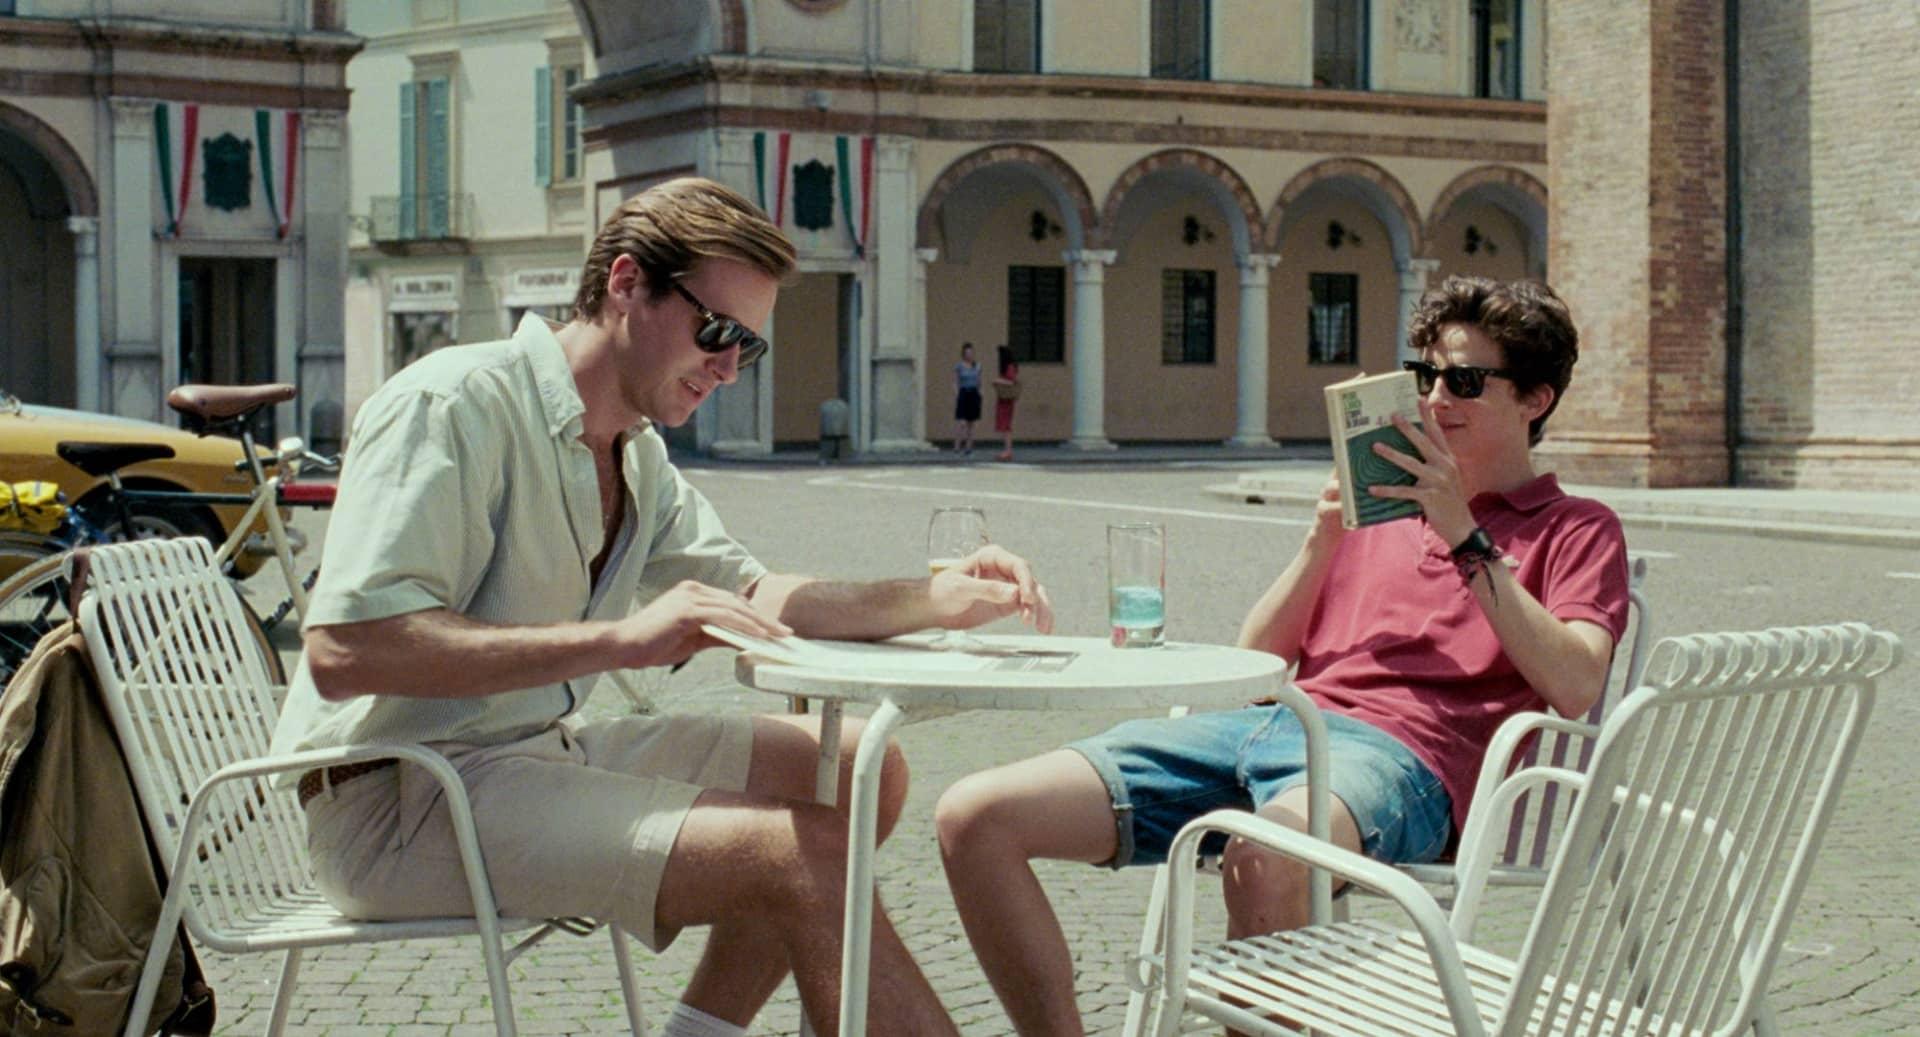 Venerdi 21 Settembre sui canali Sky Cinema HD